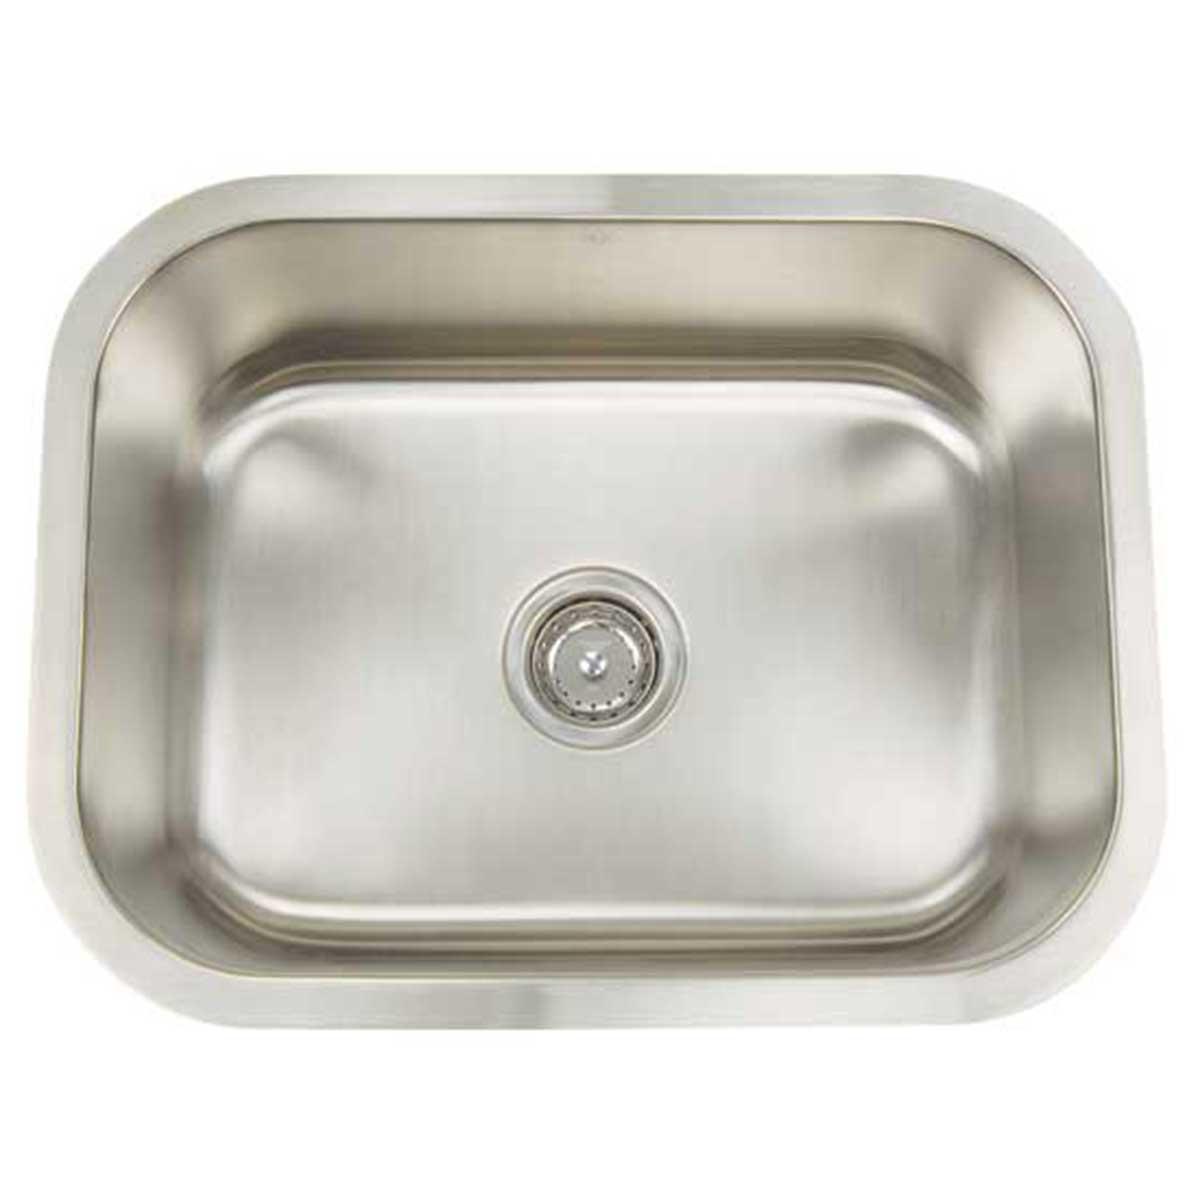 Artisan AR2318-D9 Single bowl